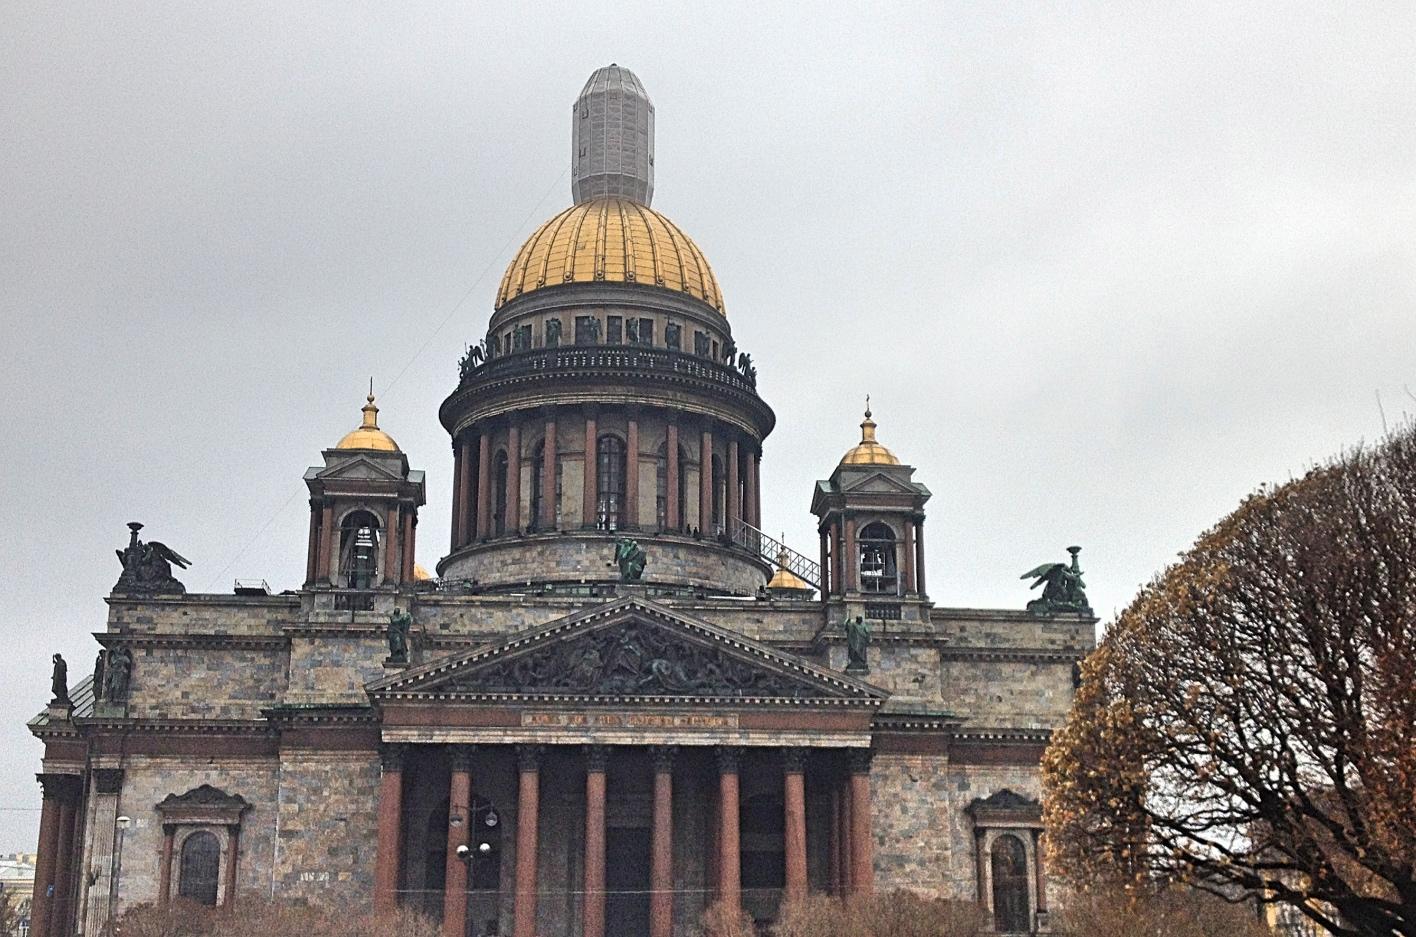 Sankt Persburg meine lieblingsstadt im Norden kathedrale